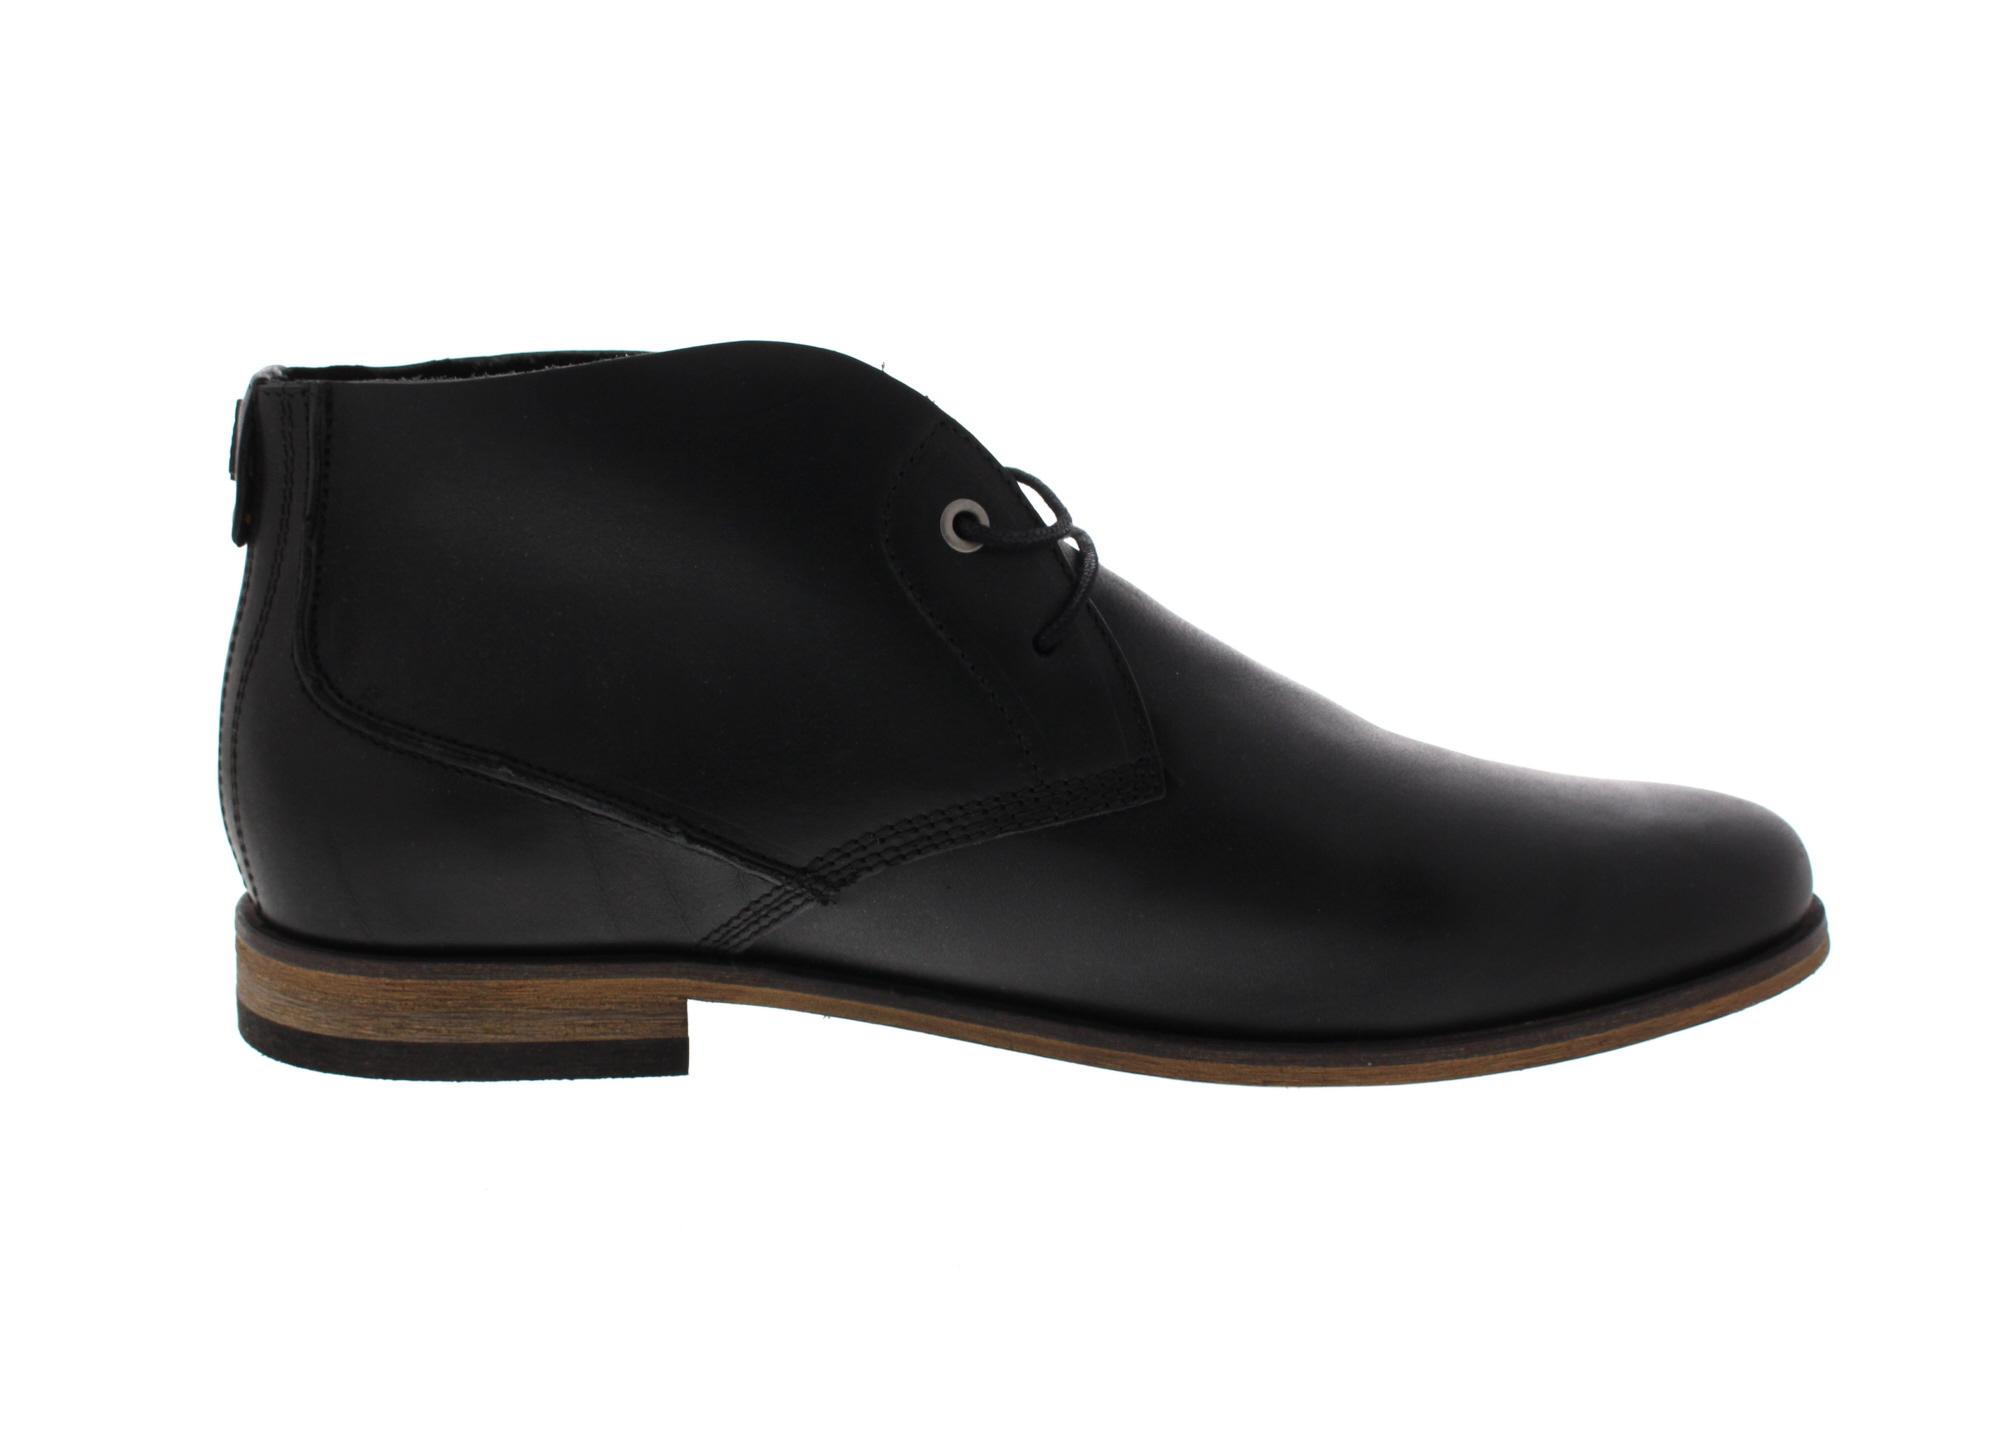 HAGHE by HUB Herrenschuhe Boots SPURS black